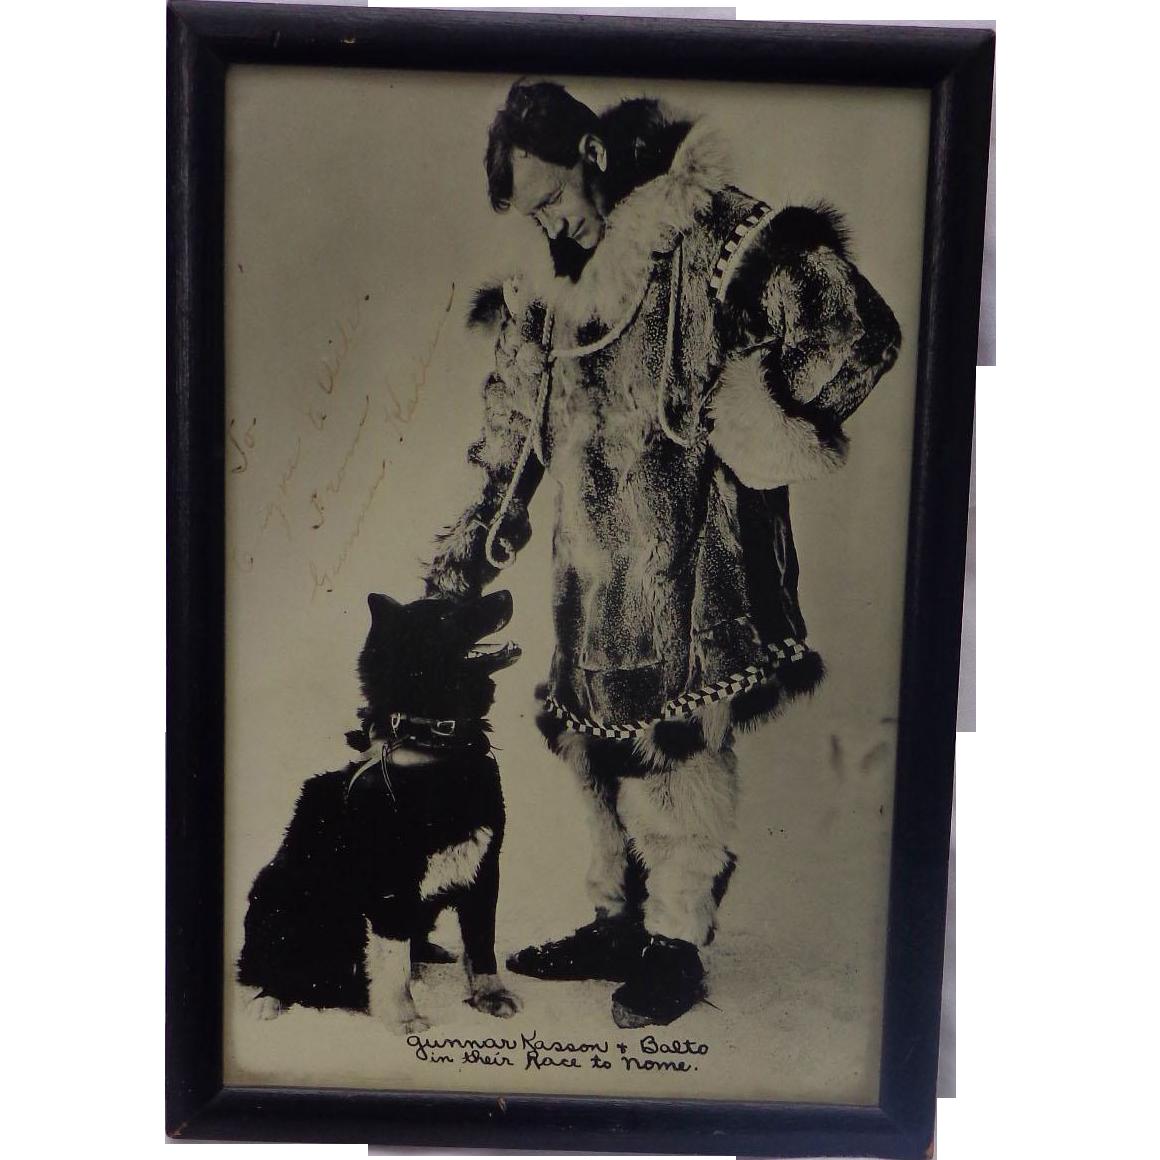 Autographed Photo of Artic and musher legend Gunnar Kaasen